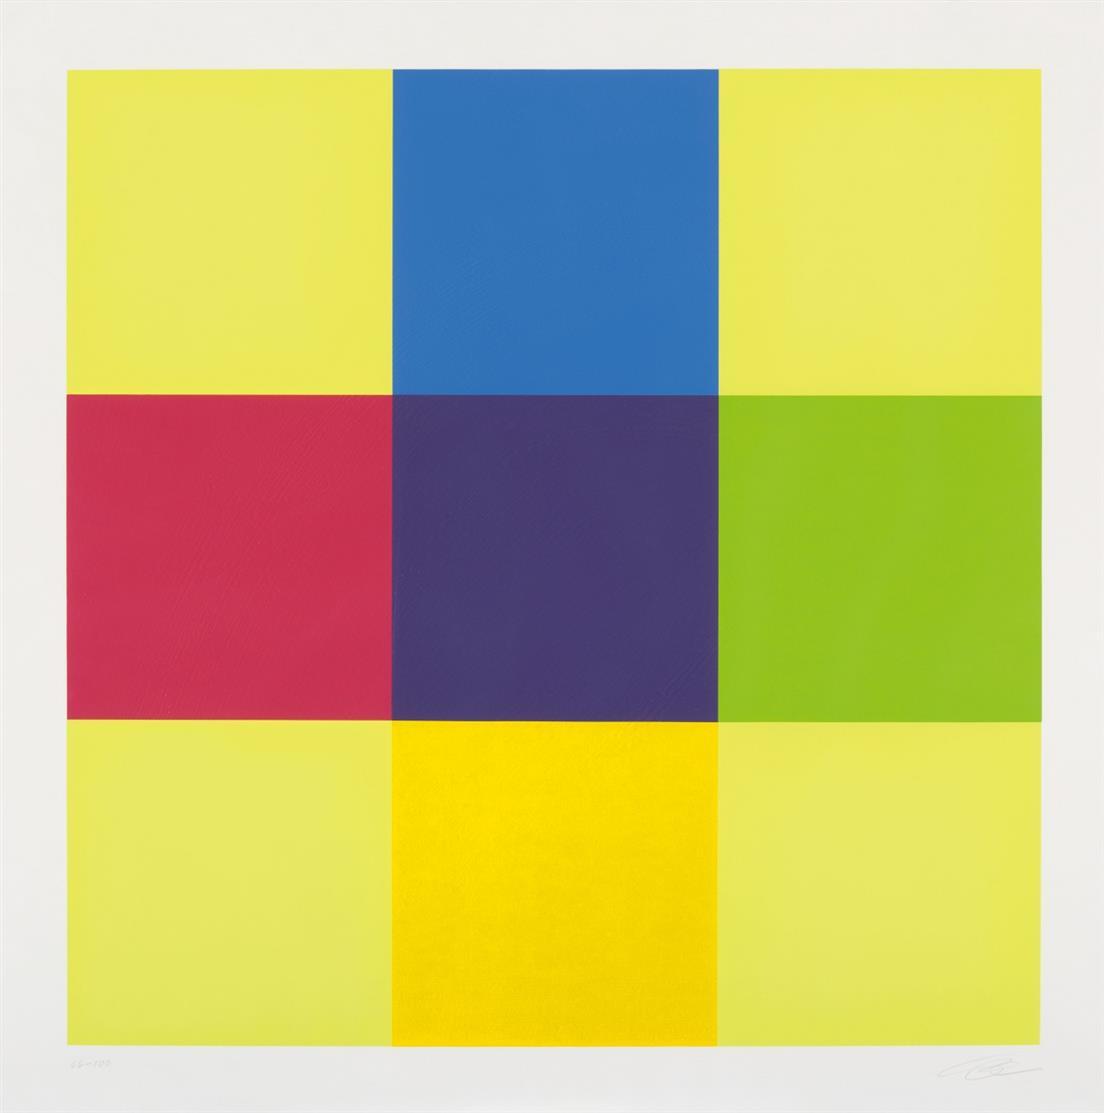 Richard Paul Lohse. Aus: Modulare Ordnung. Farbserigraphie. Signiert. Ex. 66/100.